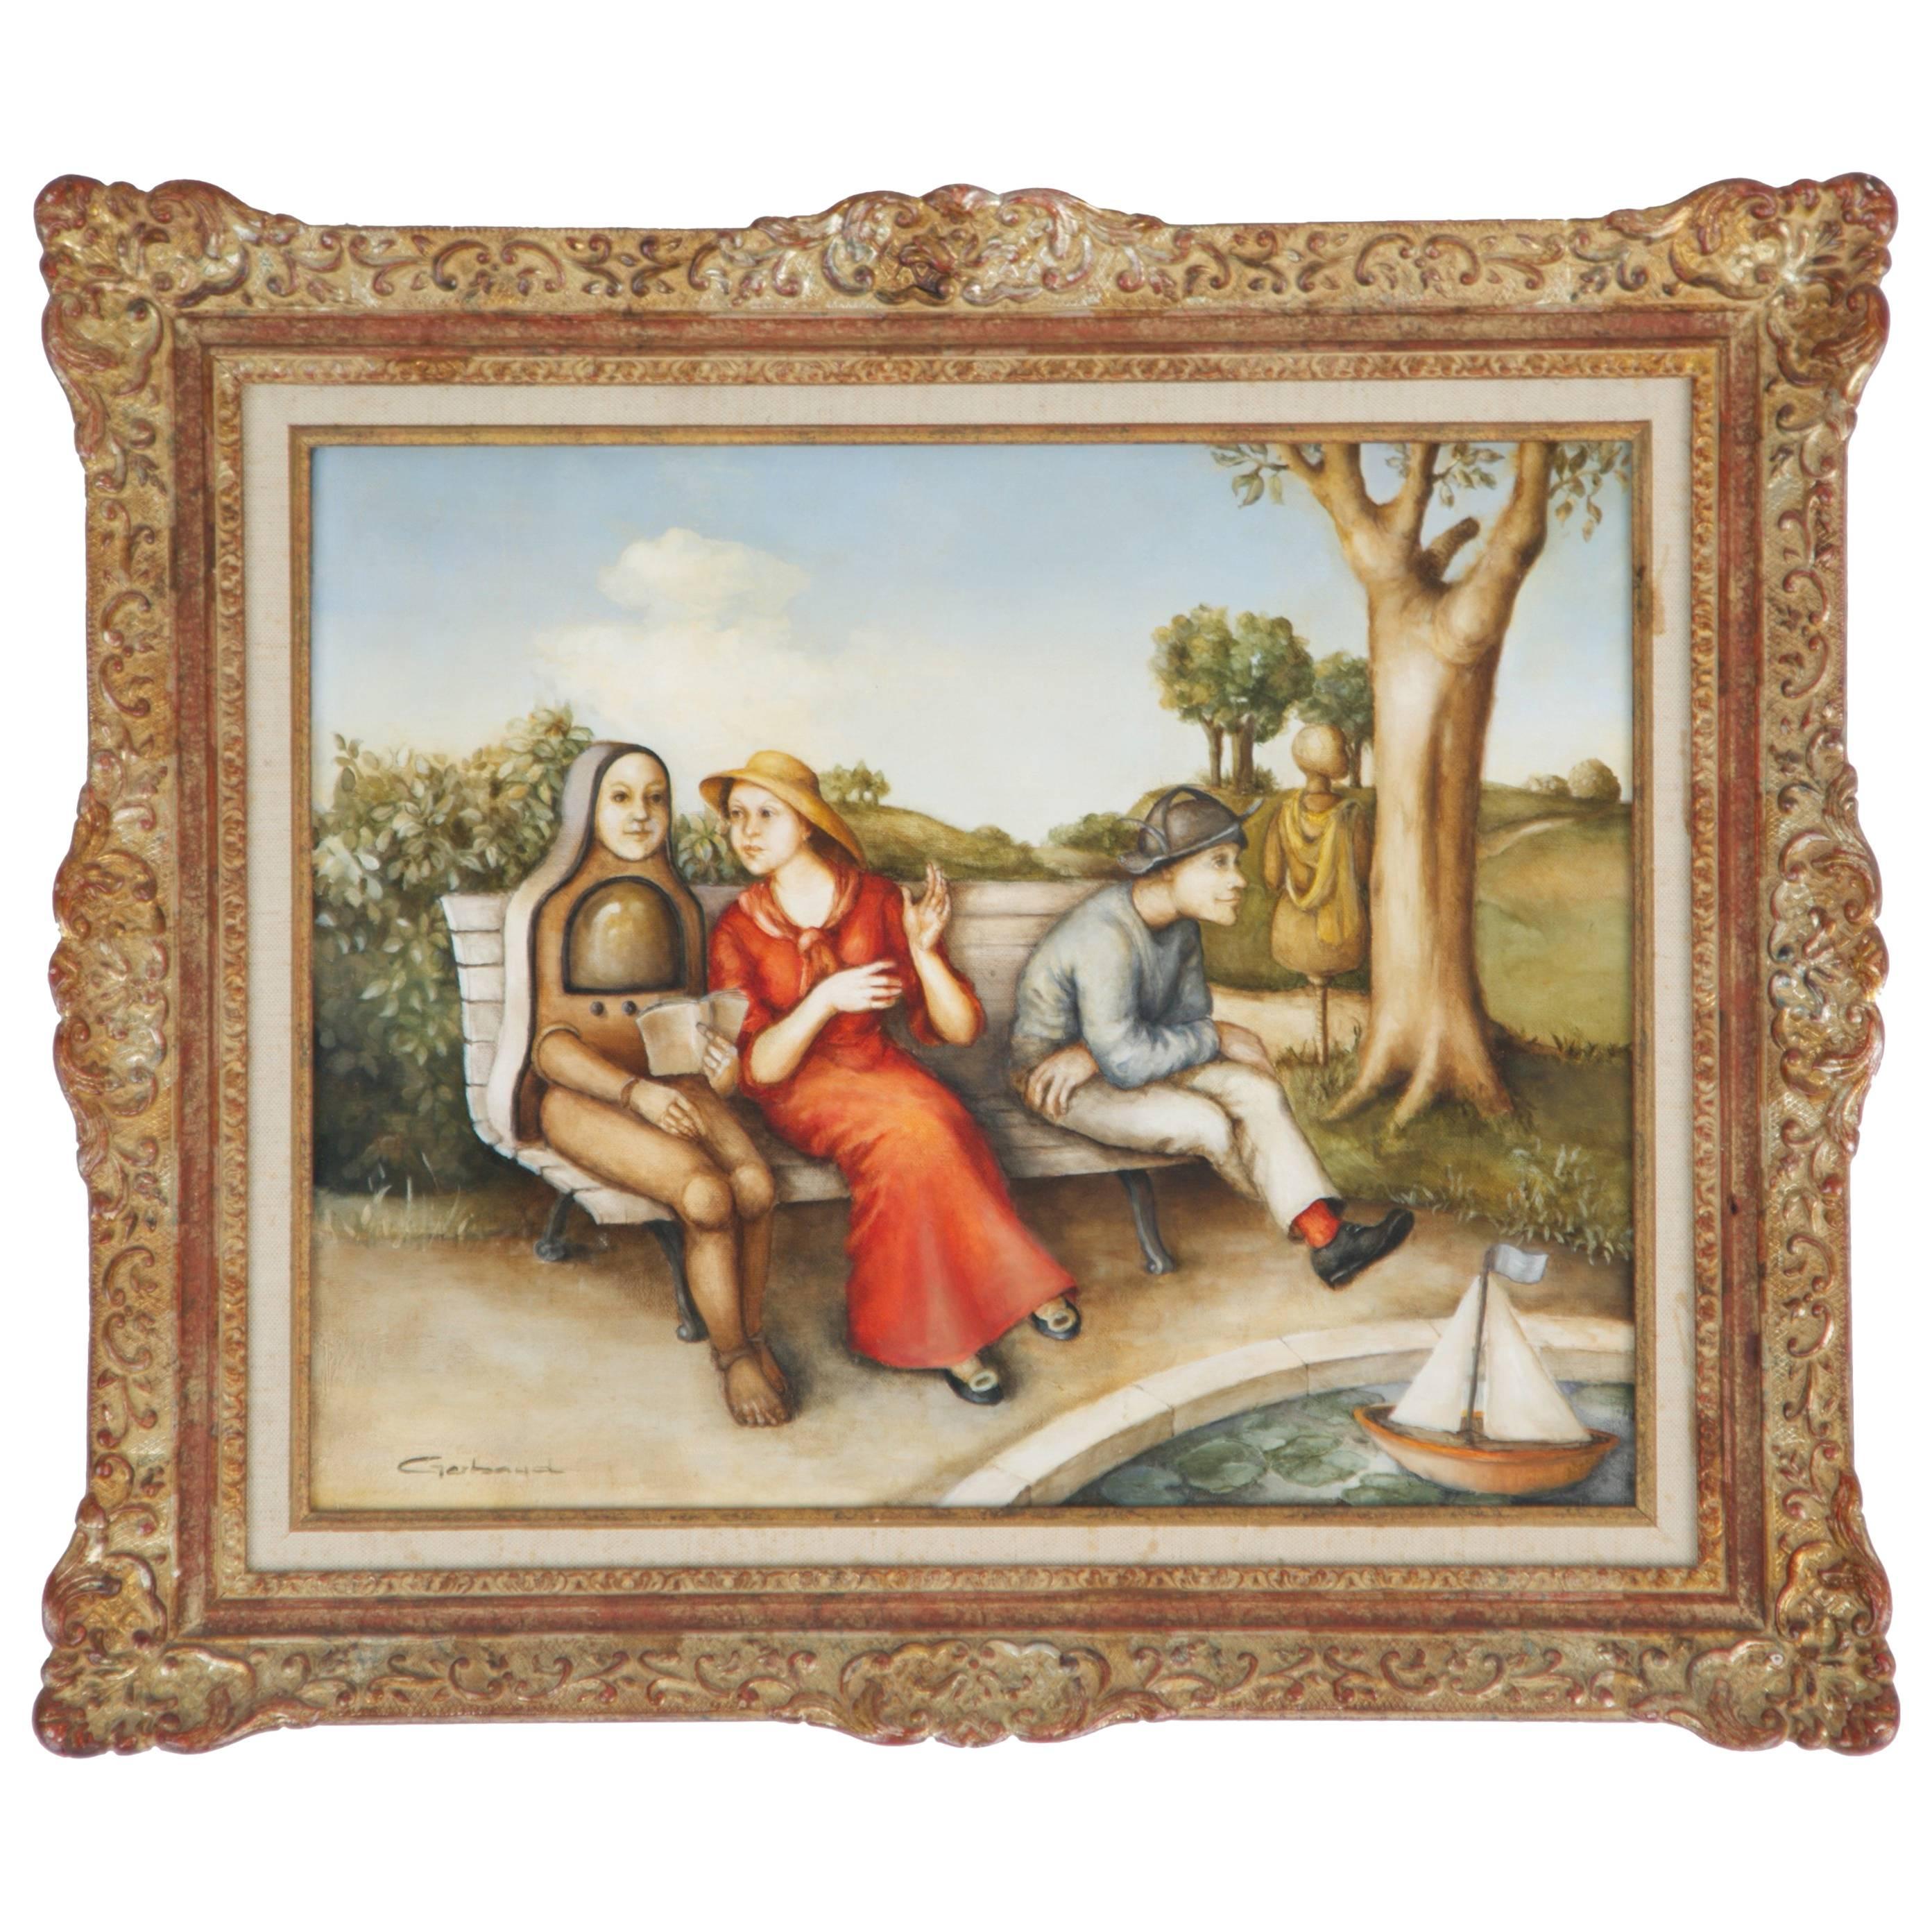 Gerbaud Continental School Original Painting, Oil on Canvas